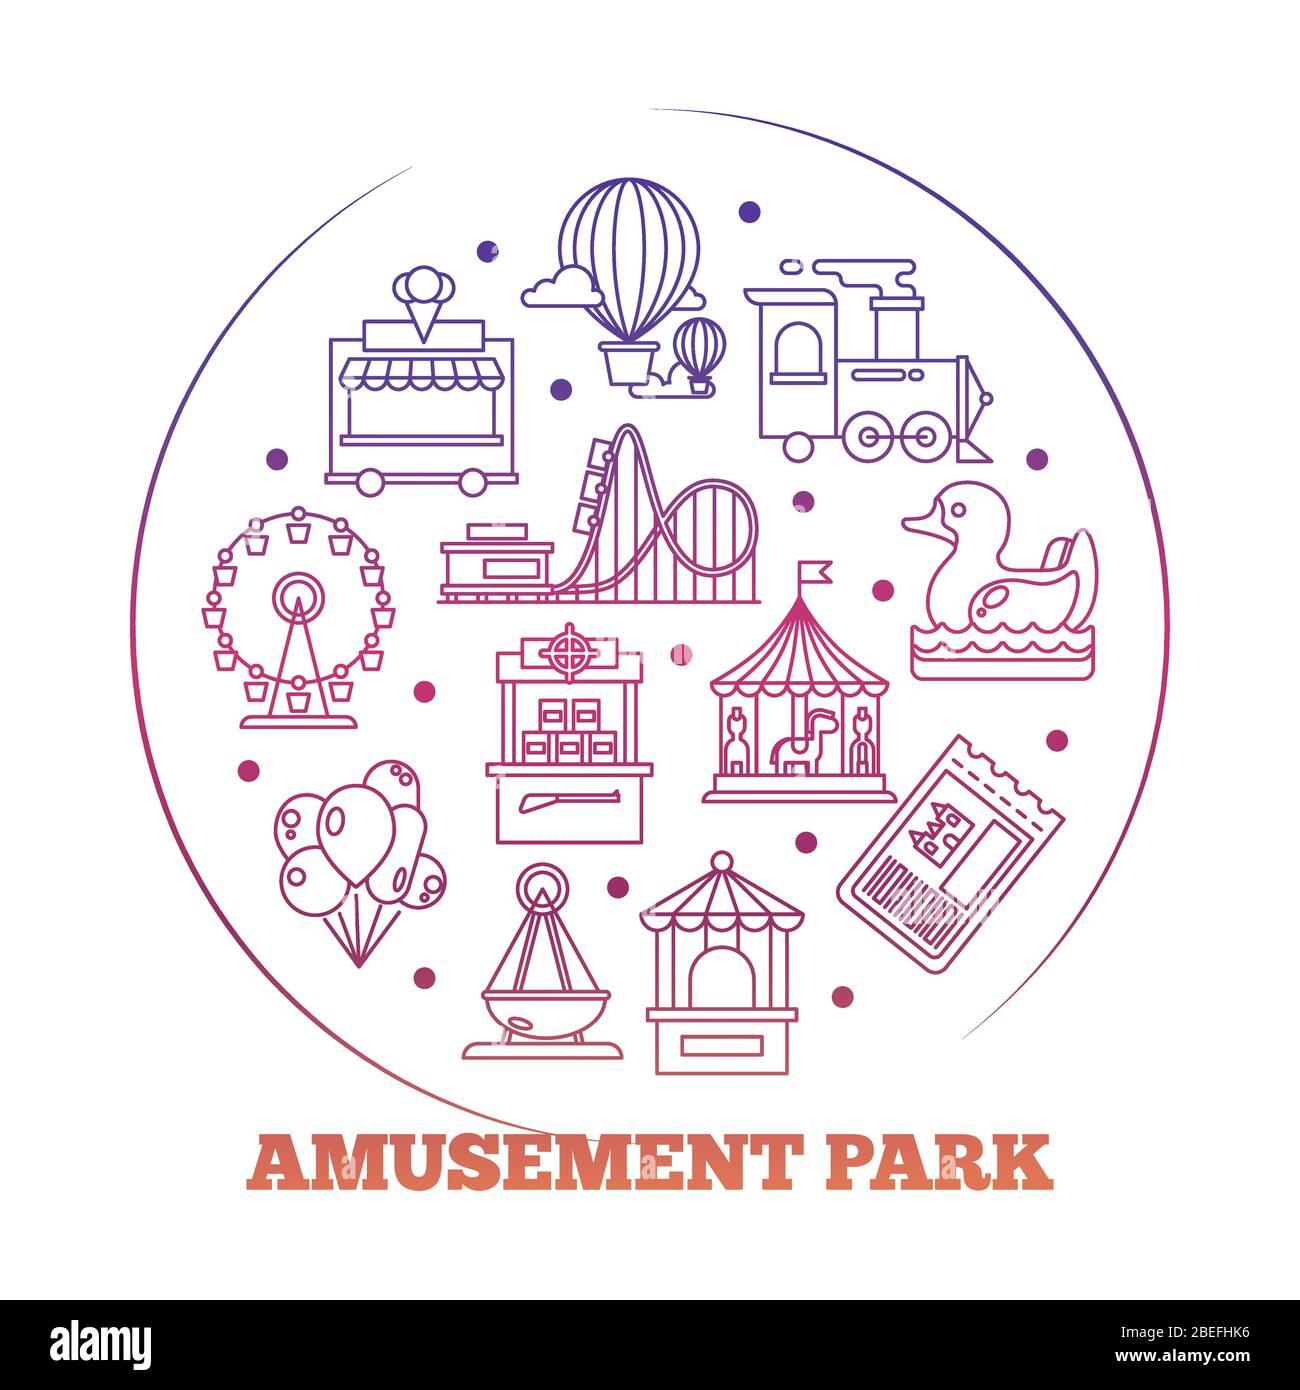 Line Icons Flat Amusement Park Round Logo Design Vector Illustration Stock Vector Image Art Alamy